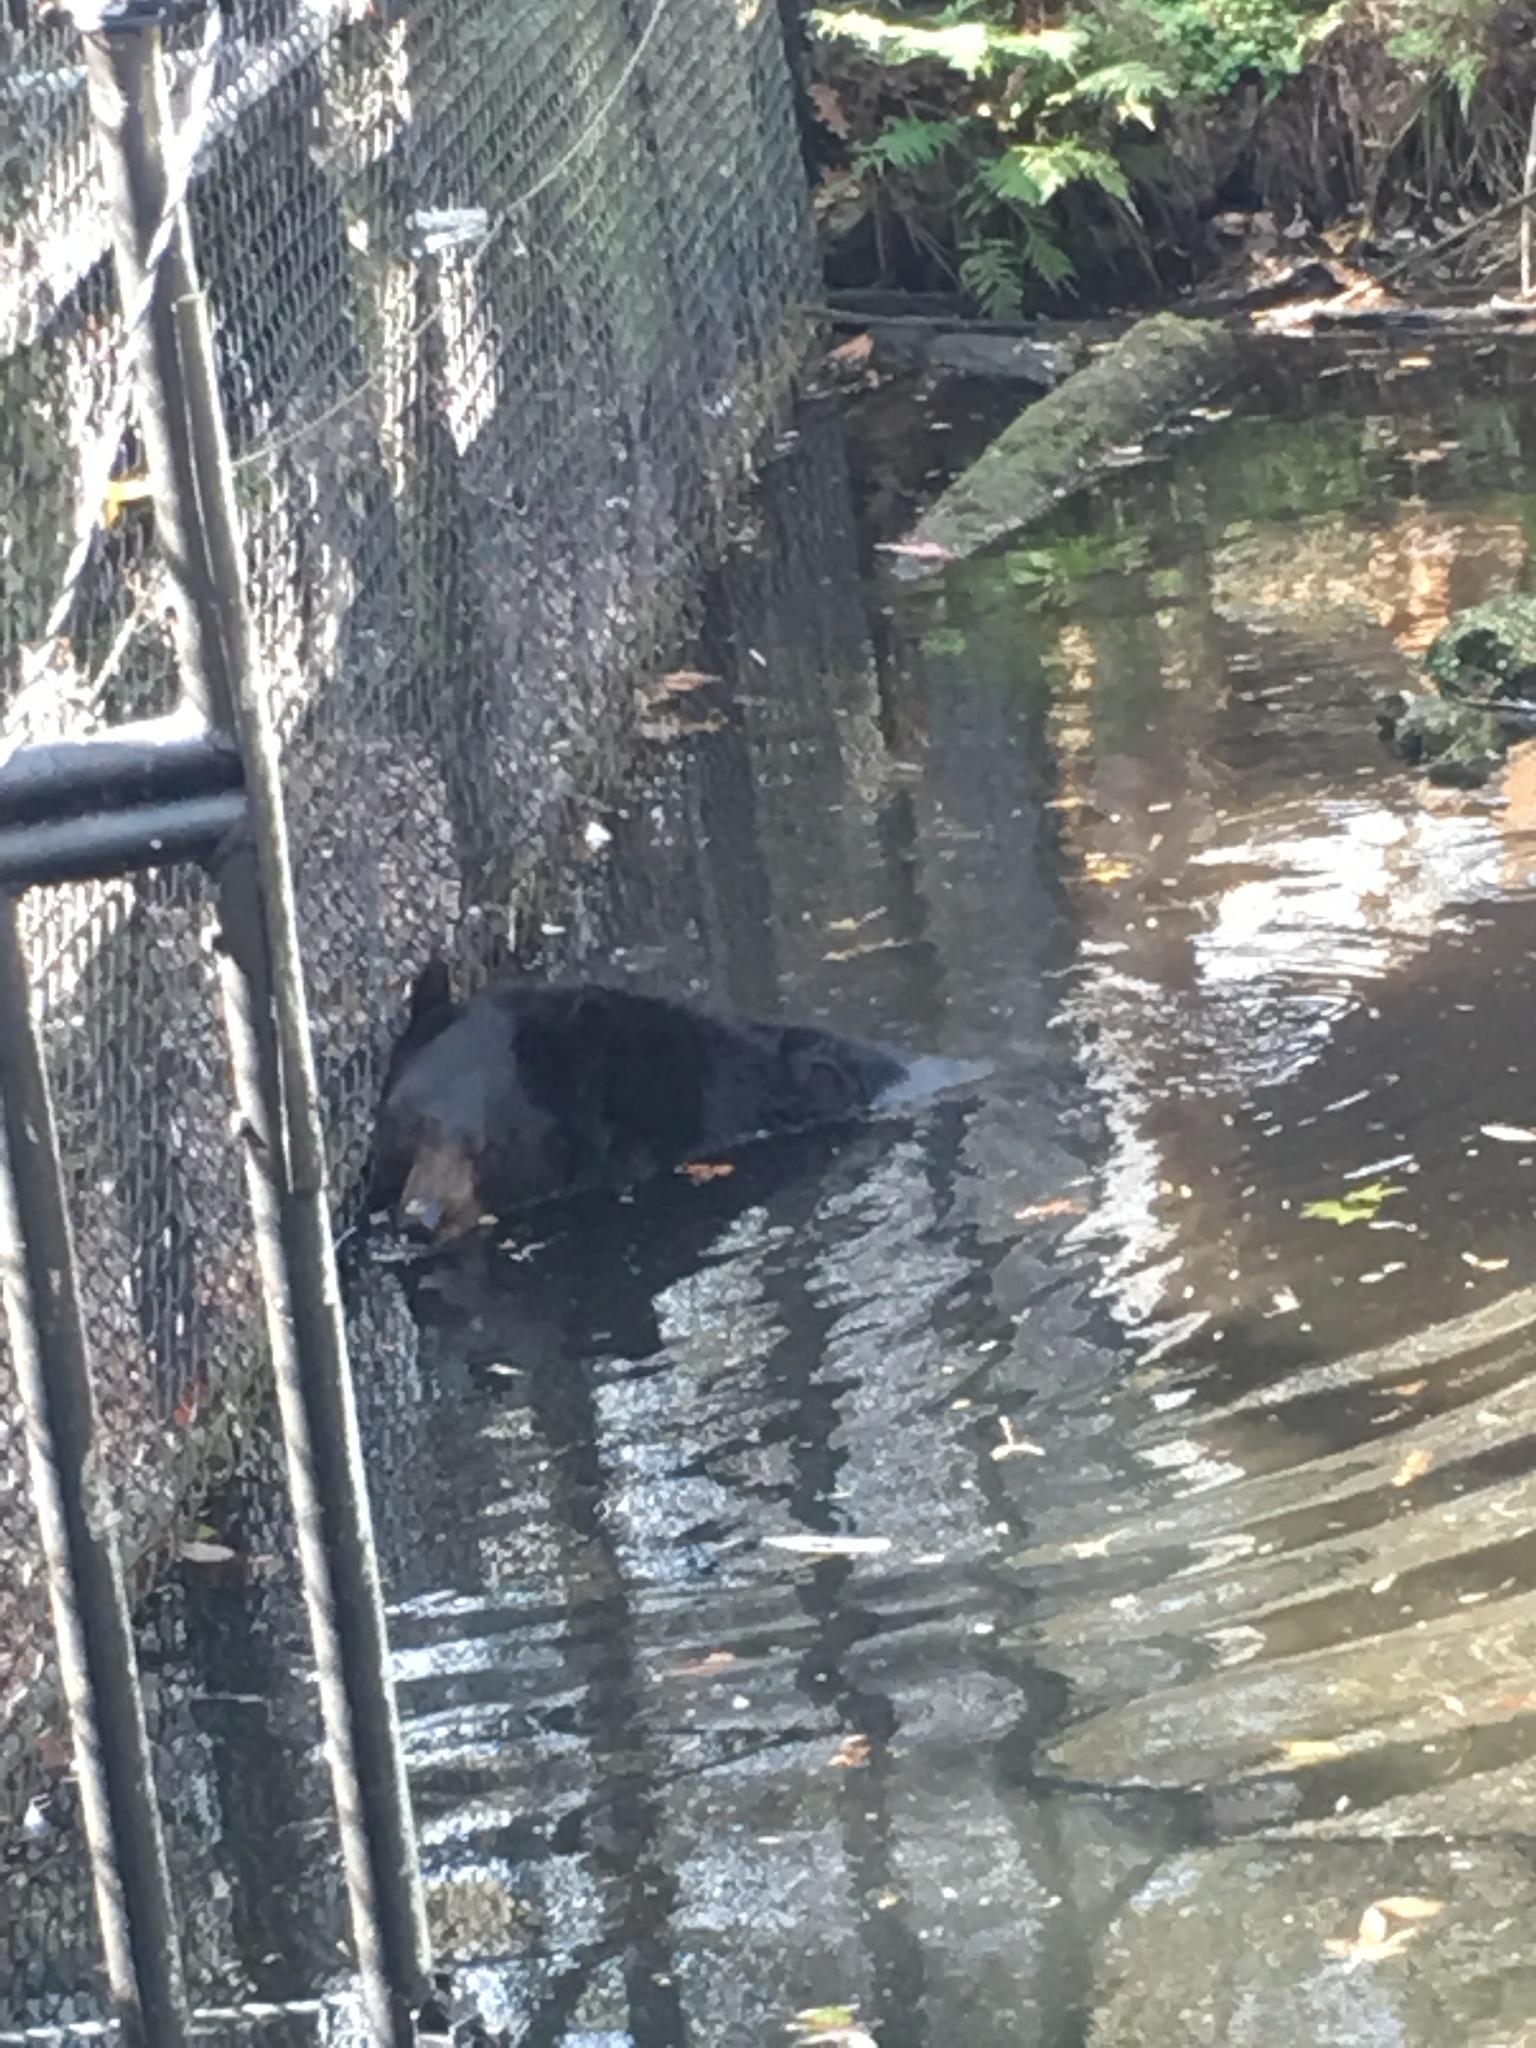 bear bath by pamela.kanarr